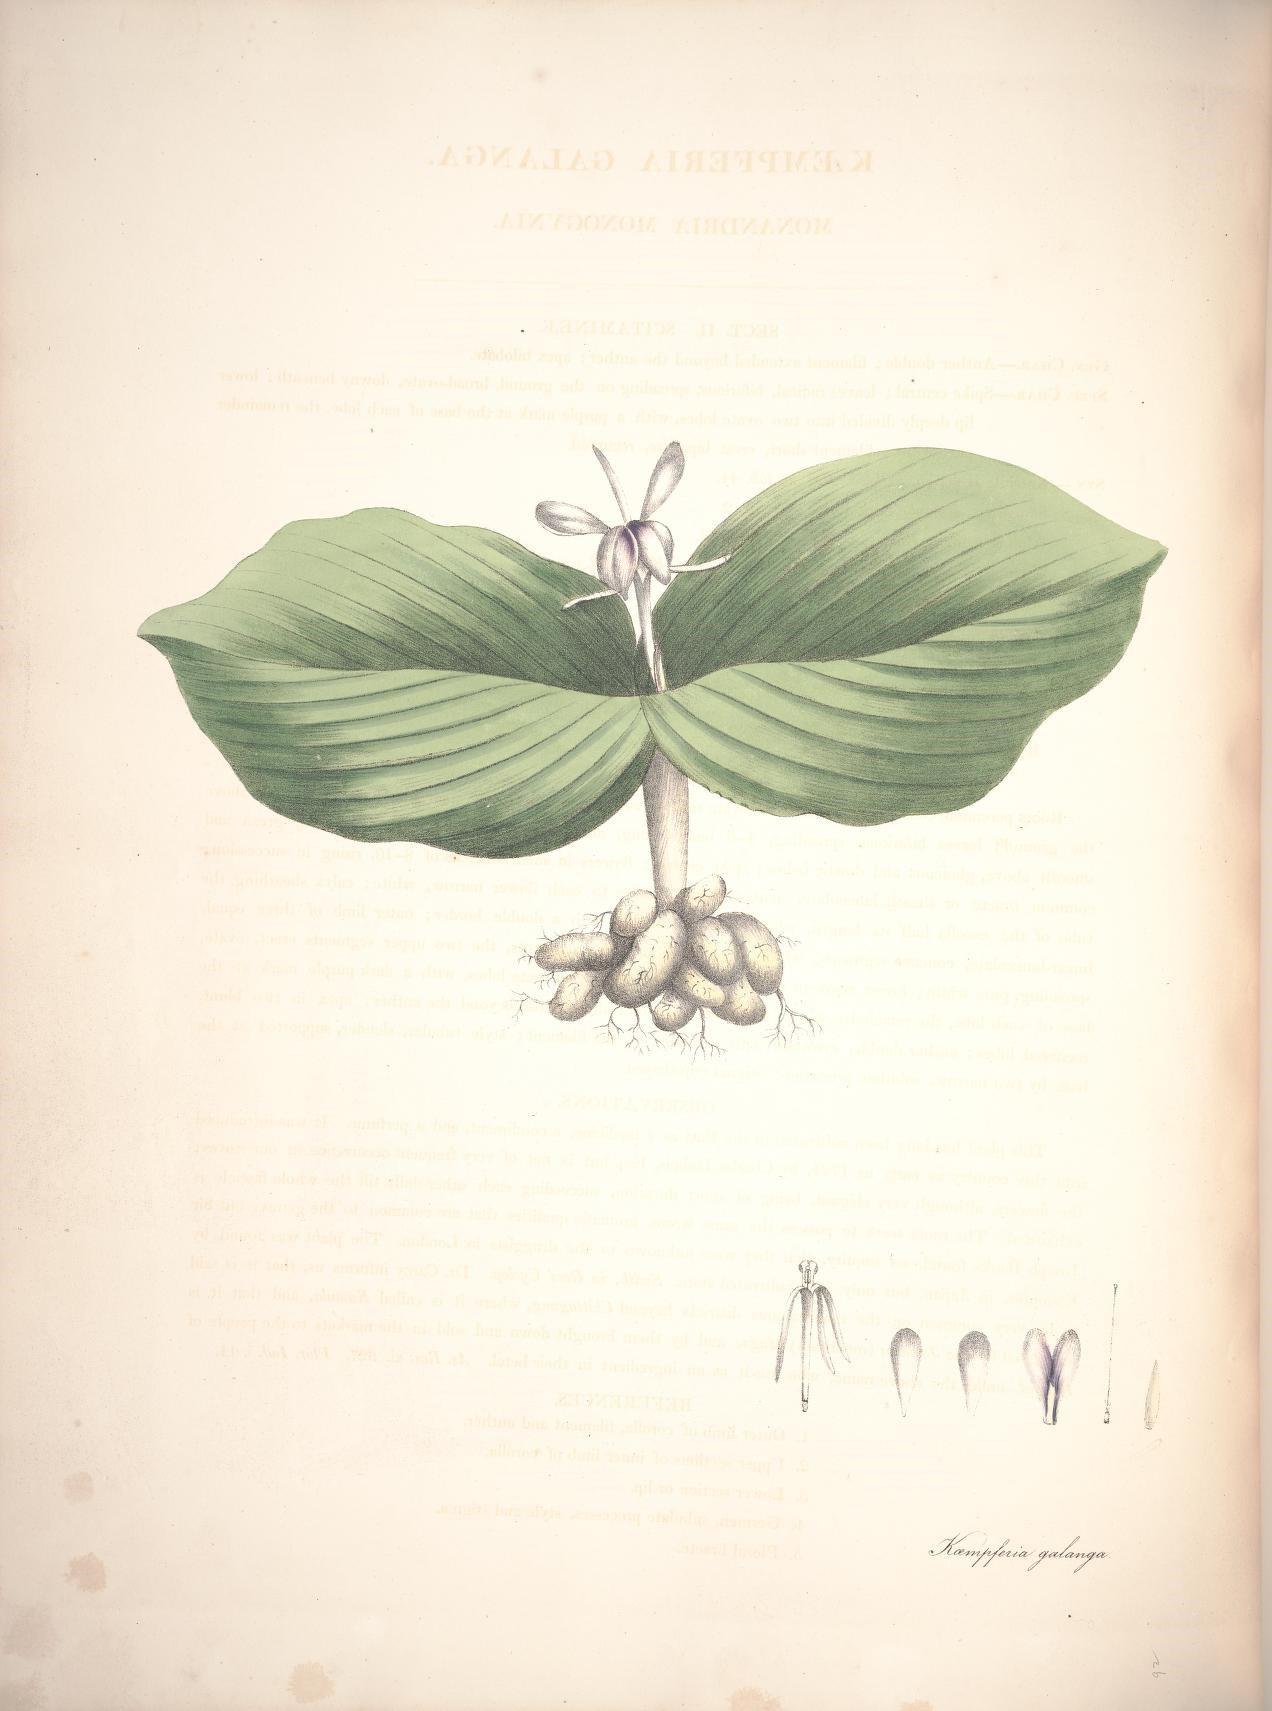 Plant-illustration-of-Aromatic-ginger